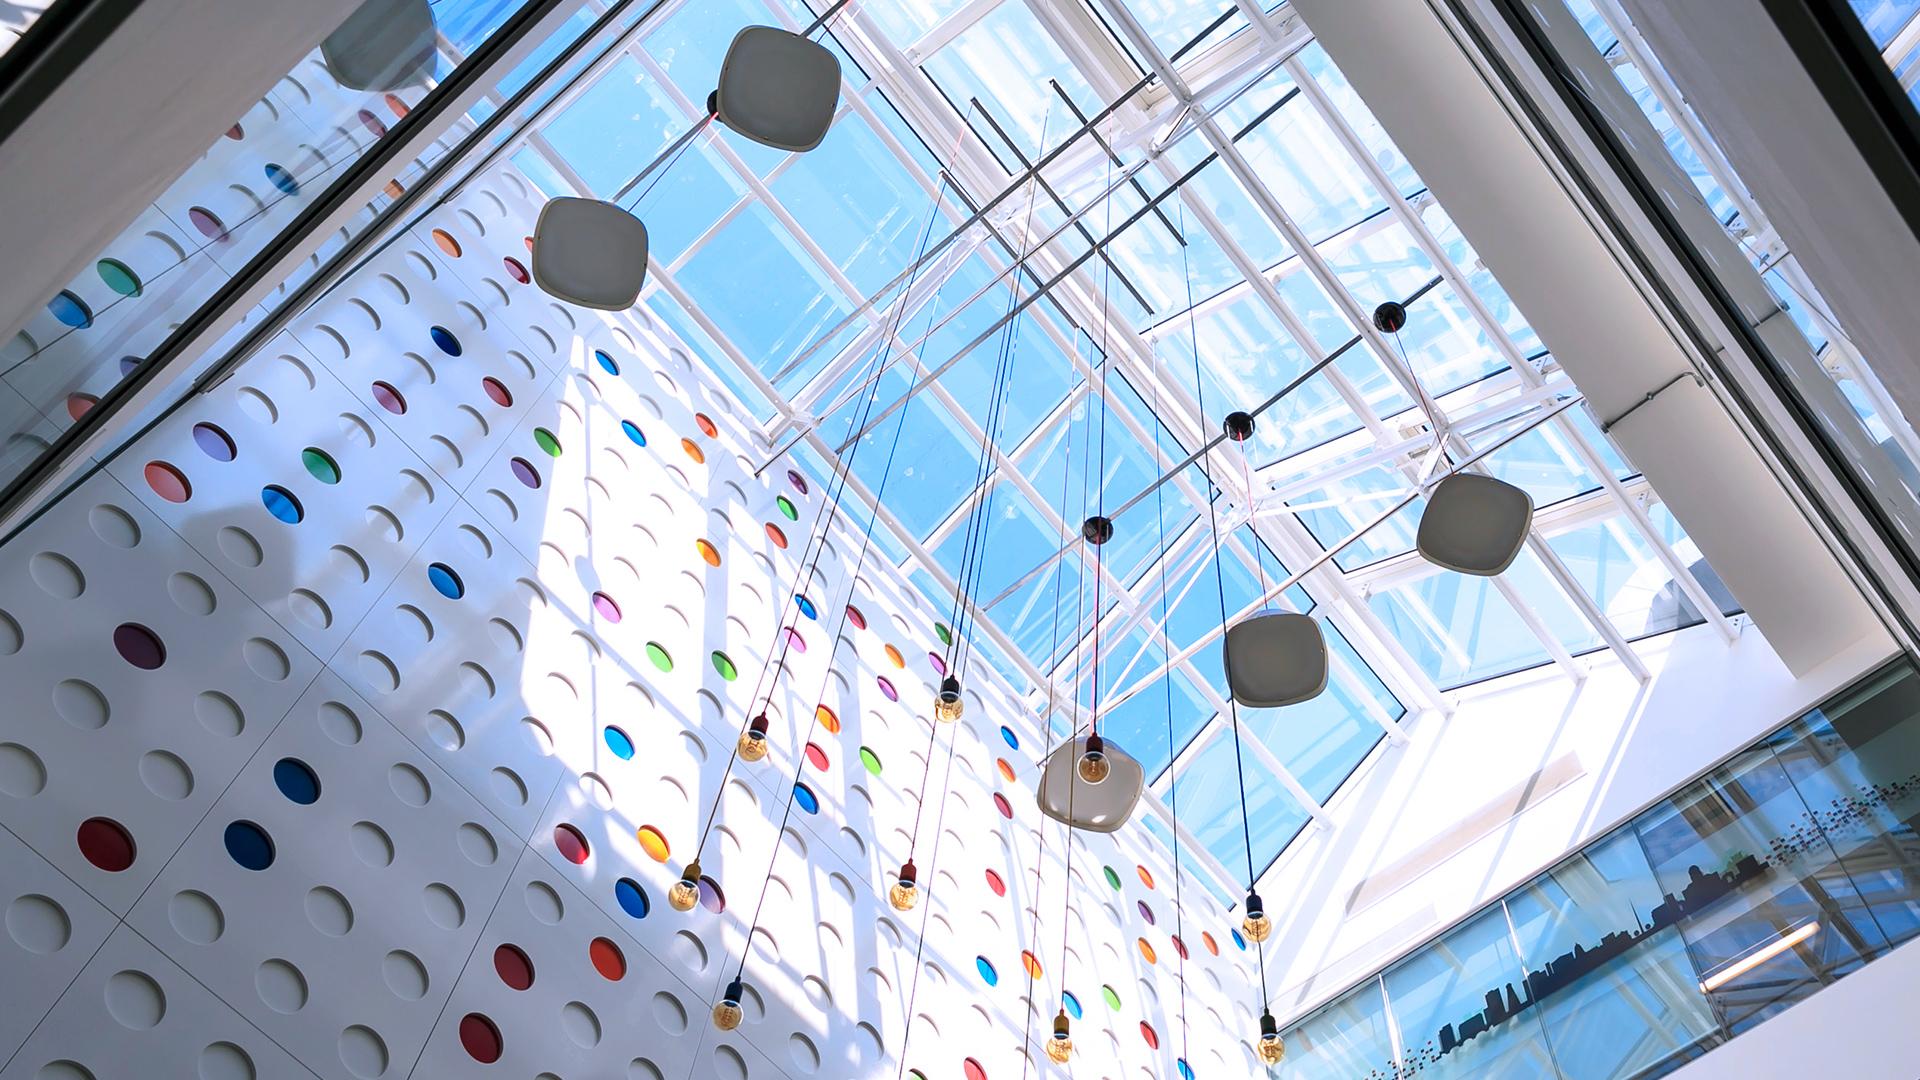 the-digital-hub-grainstore-interior-atrium-skylight